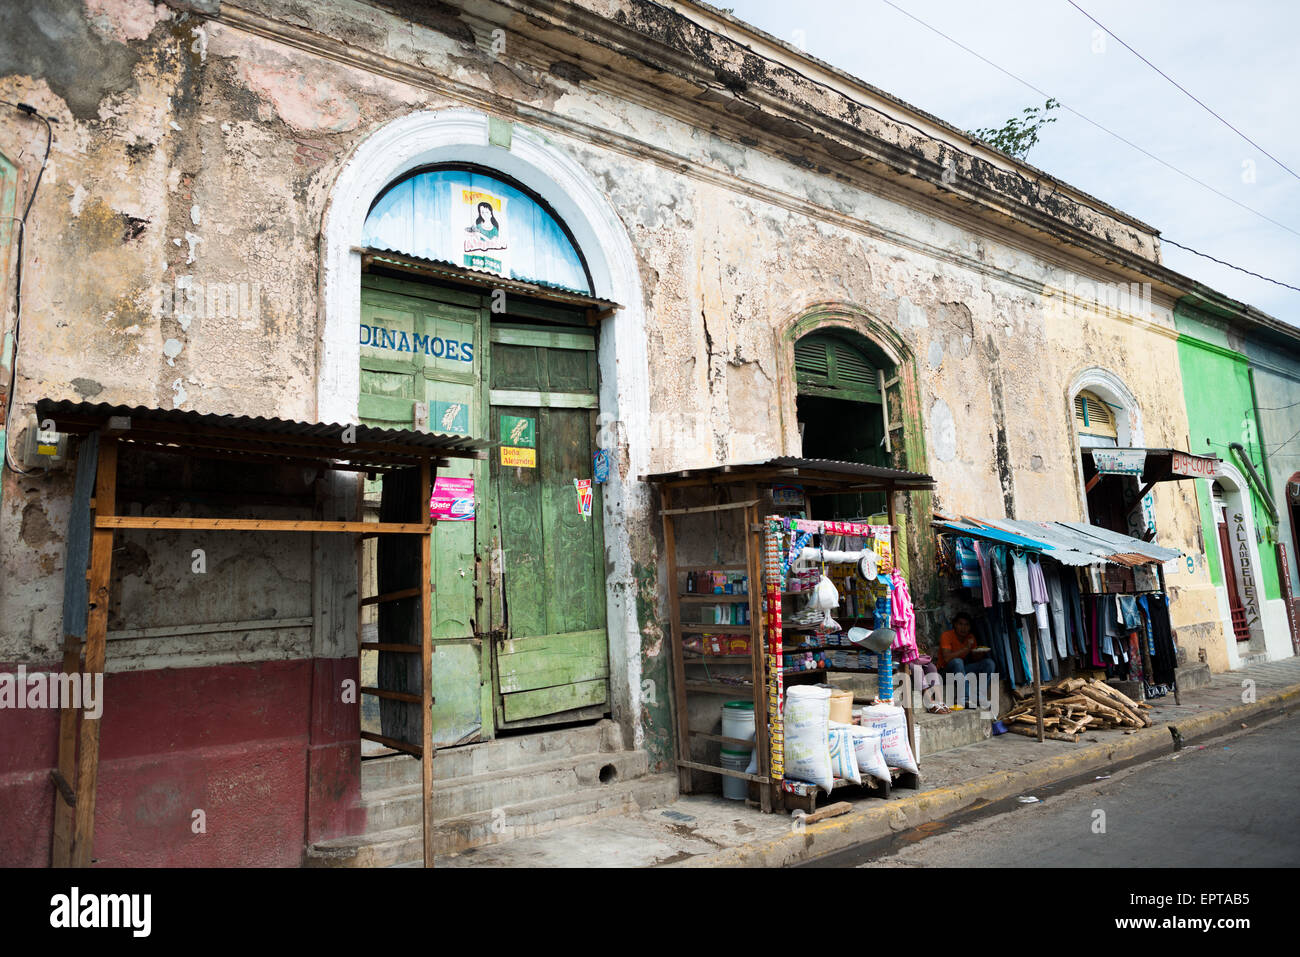 Streets of Granada, Nicaragua - Stock Image